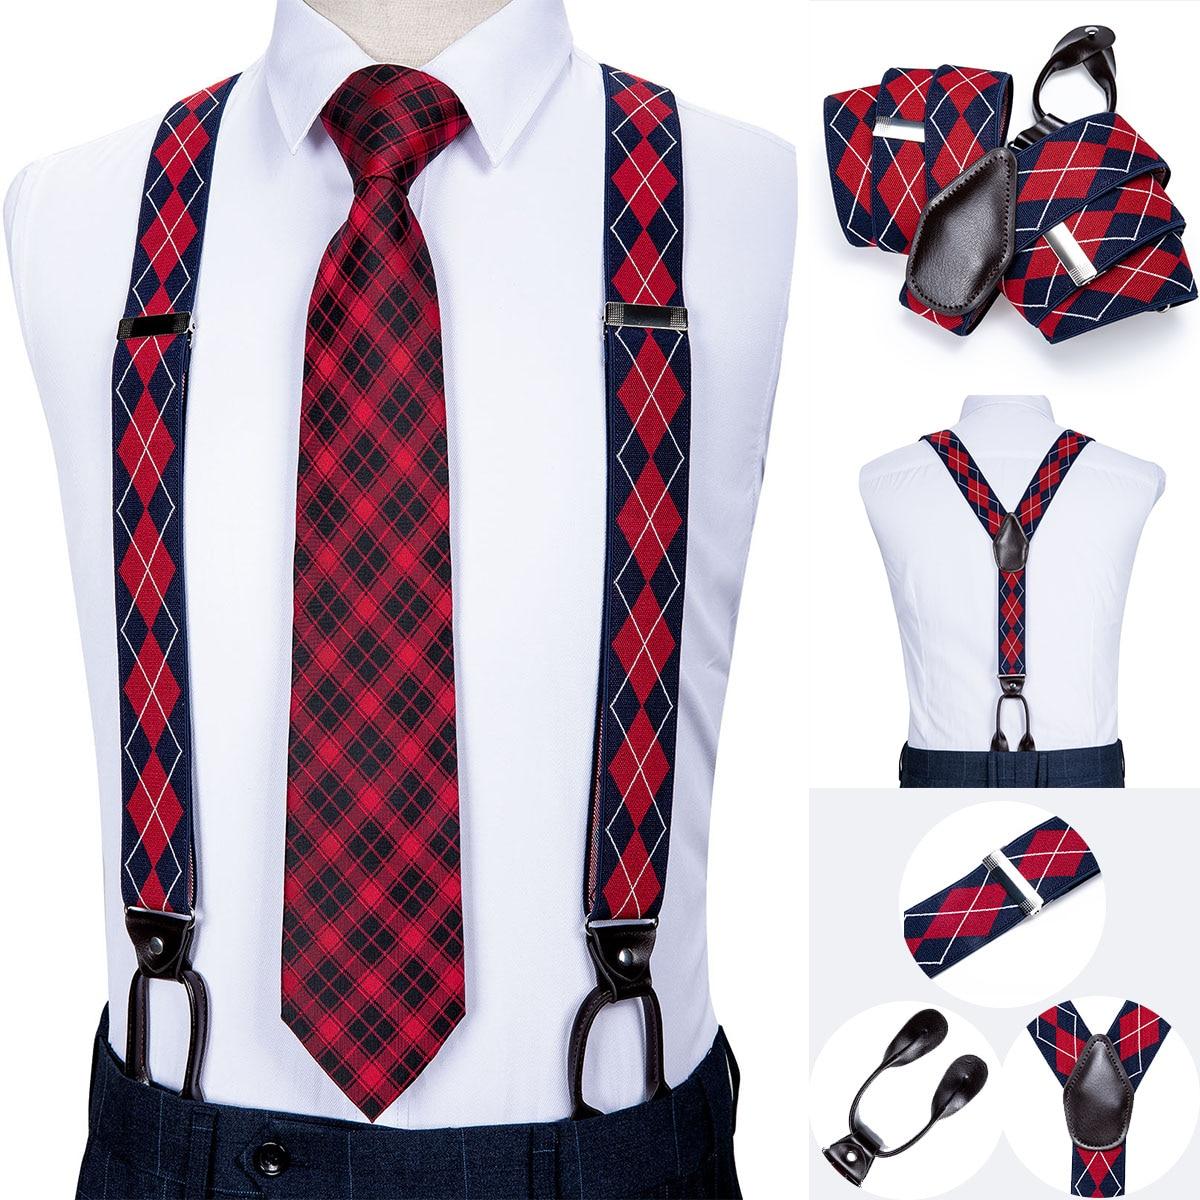 DiBanGu Silk Adult Men's Suspender Leather Metal 6 Buttons Braces Red Blue Plaid Vintage Men Elastic Wedding Suspender Men